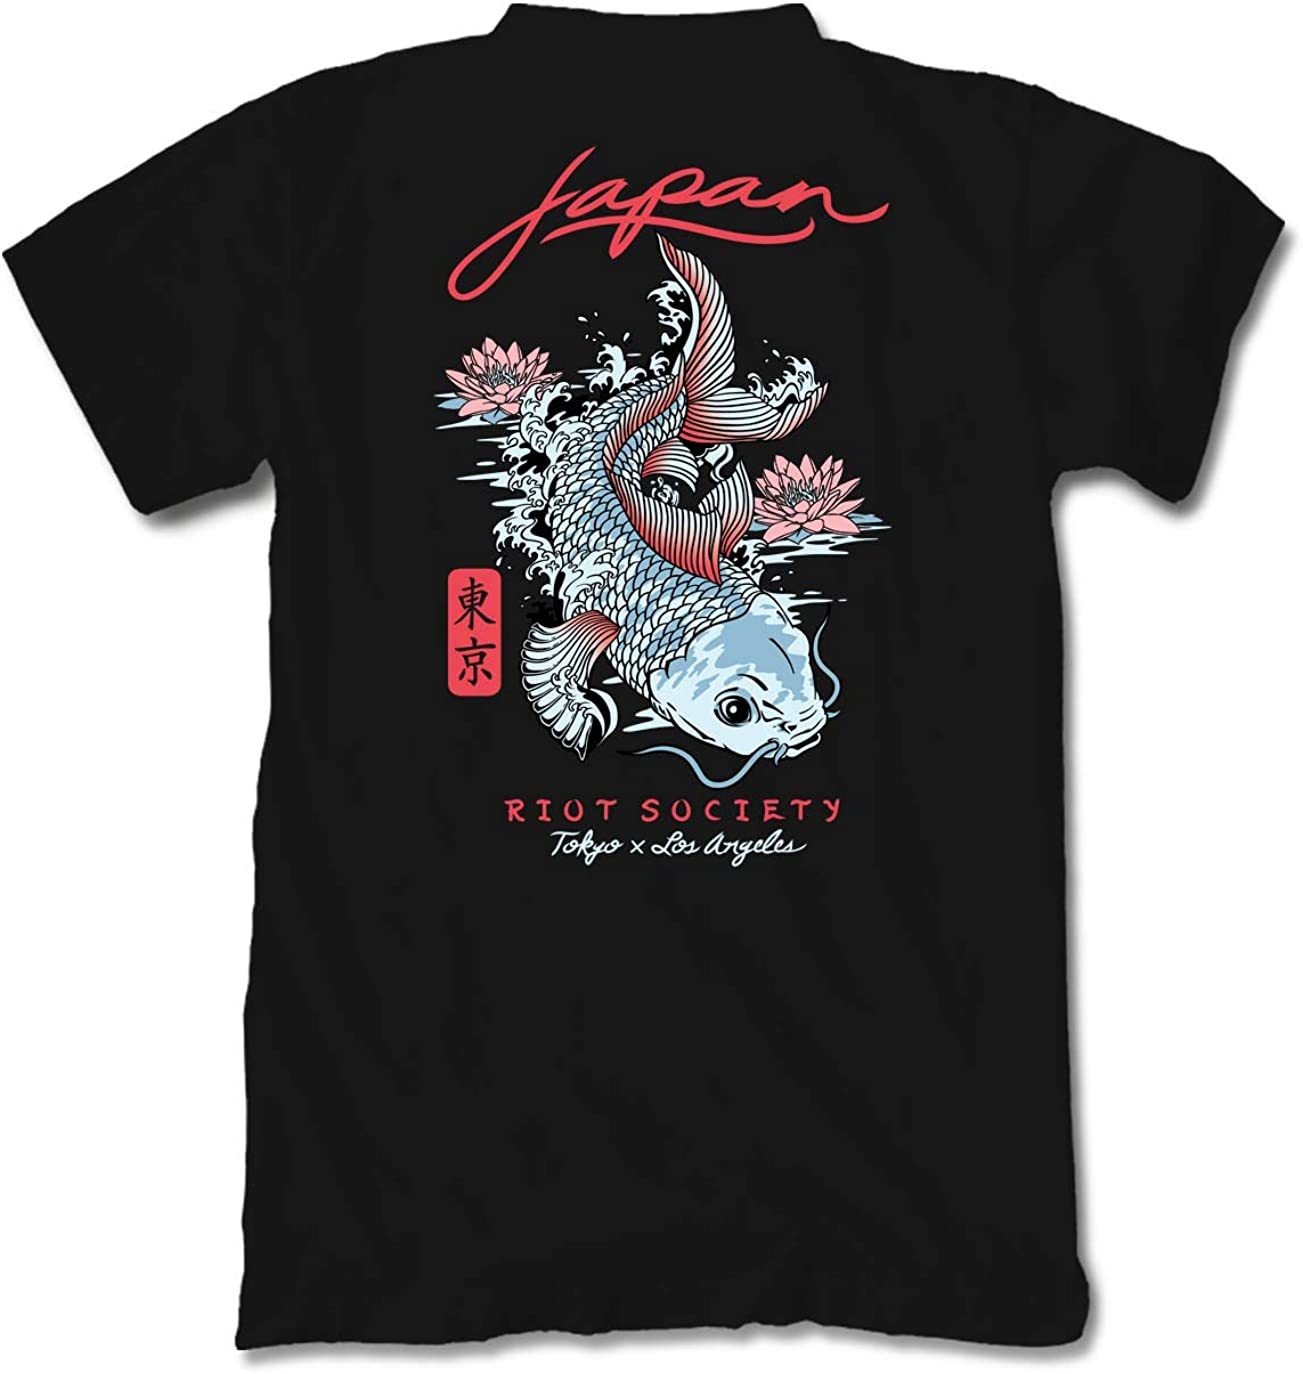 Riot Society Men's Short Sleeve Graphic Fashion T-Shirt